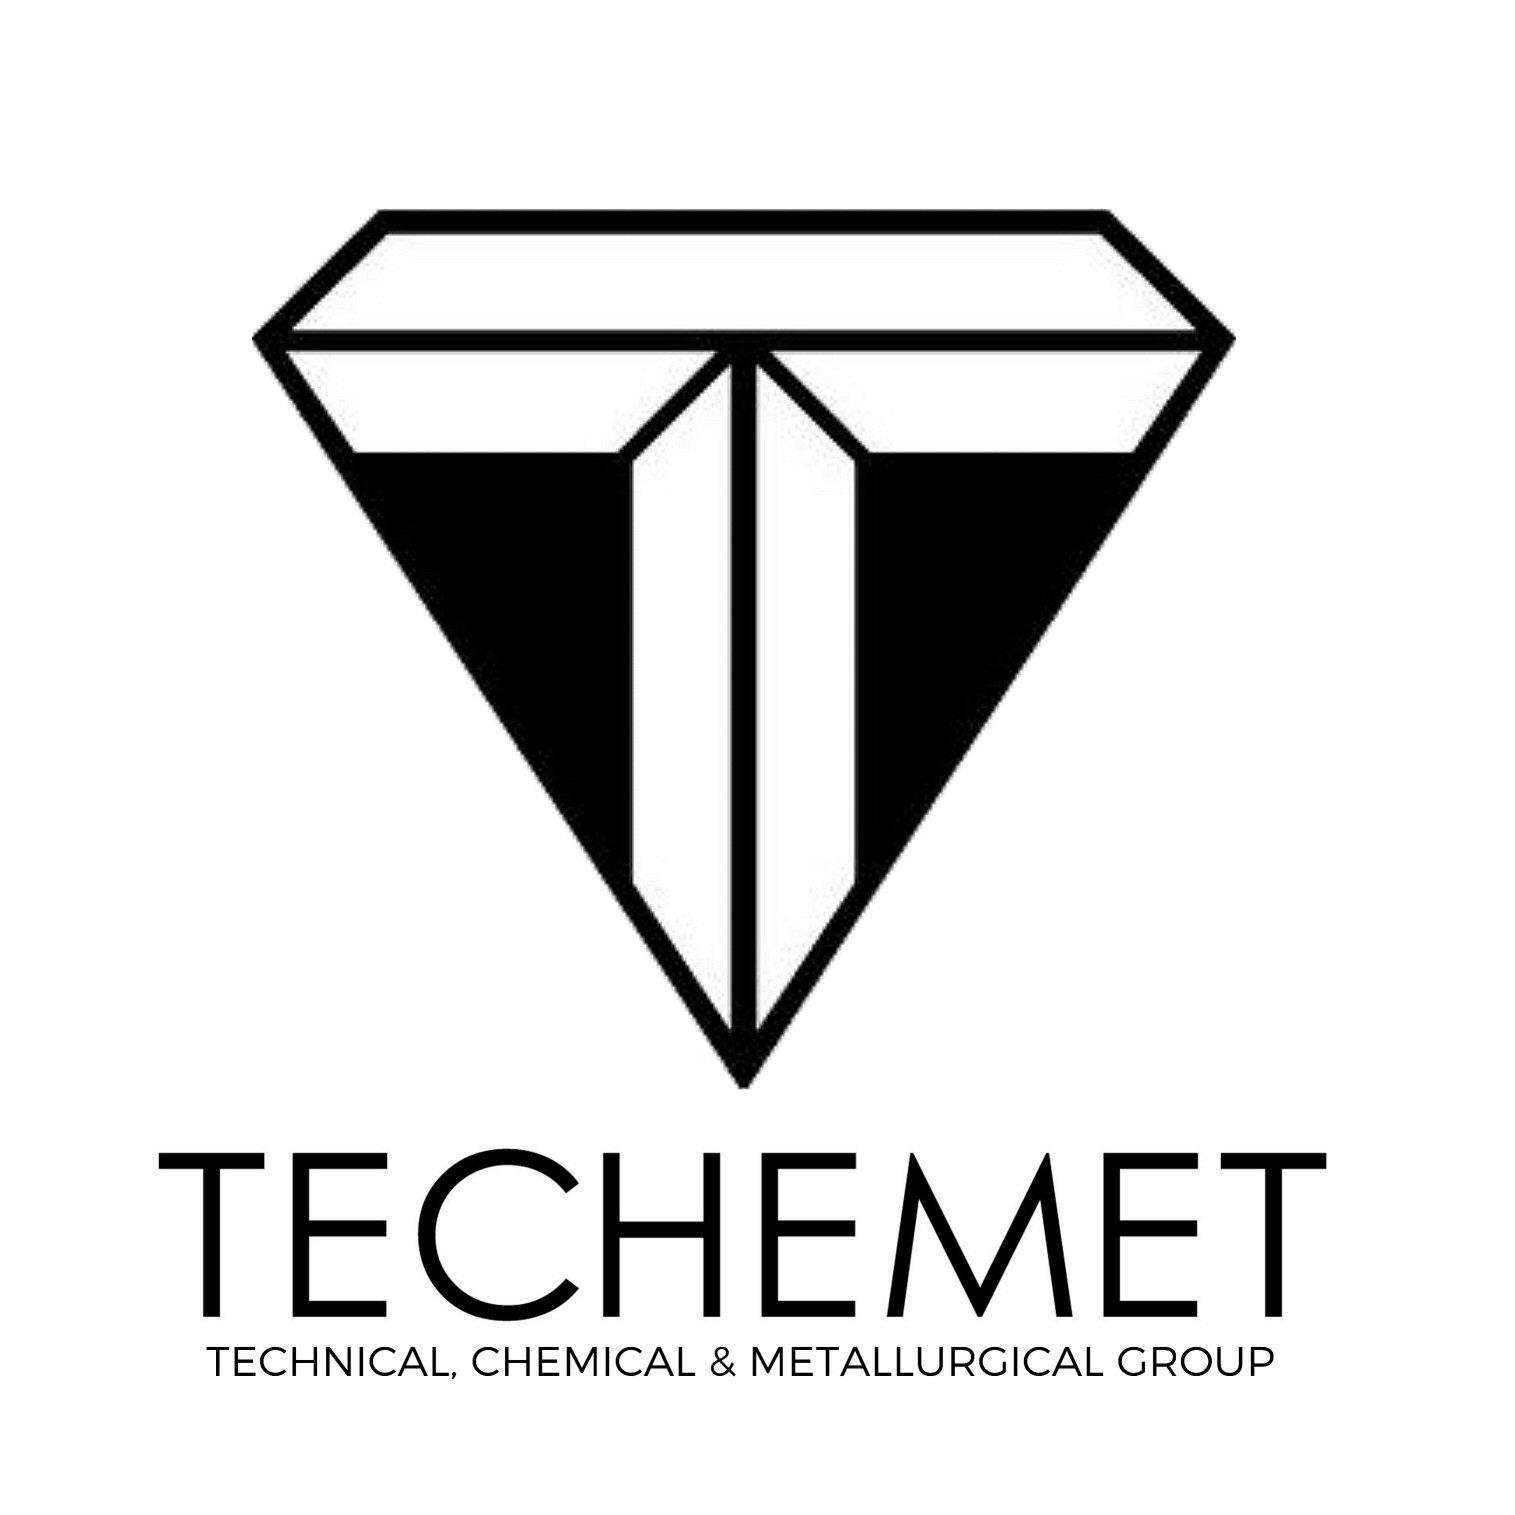 gen65v1-image-techemet-diamond-logo-w-name